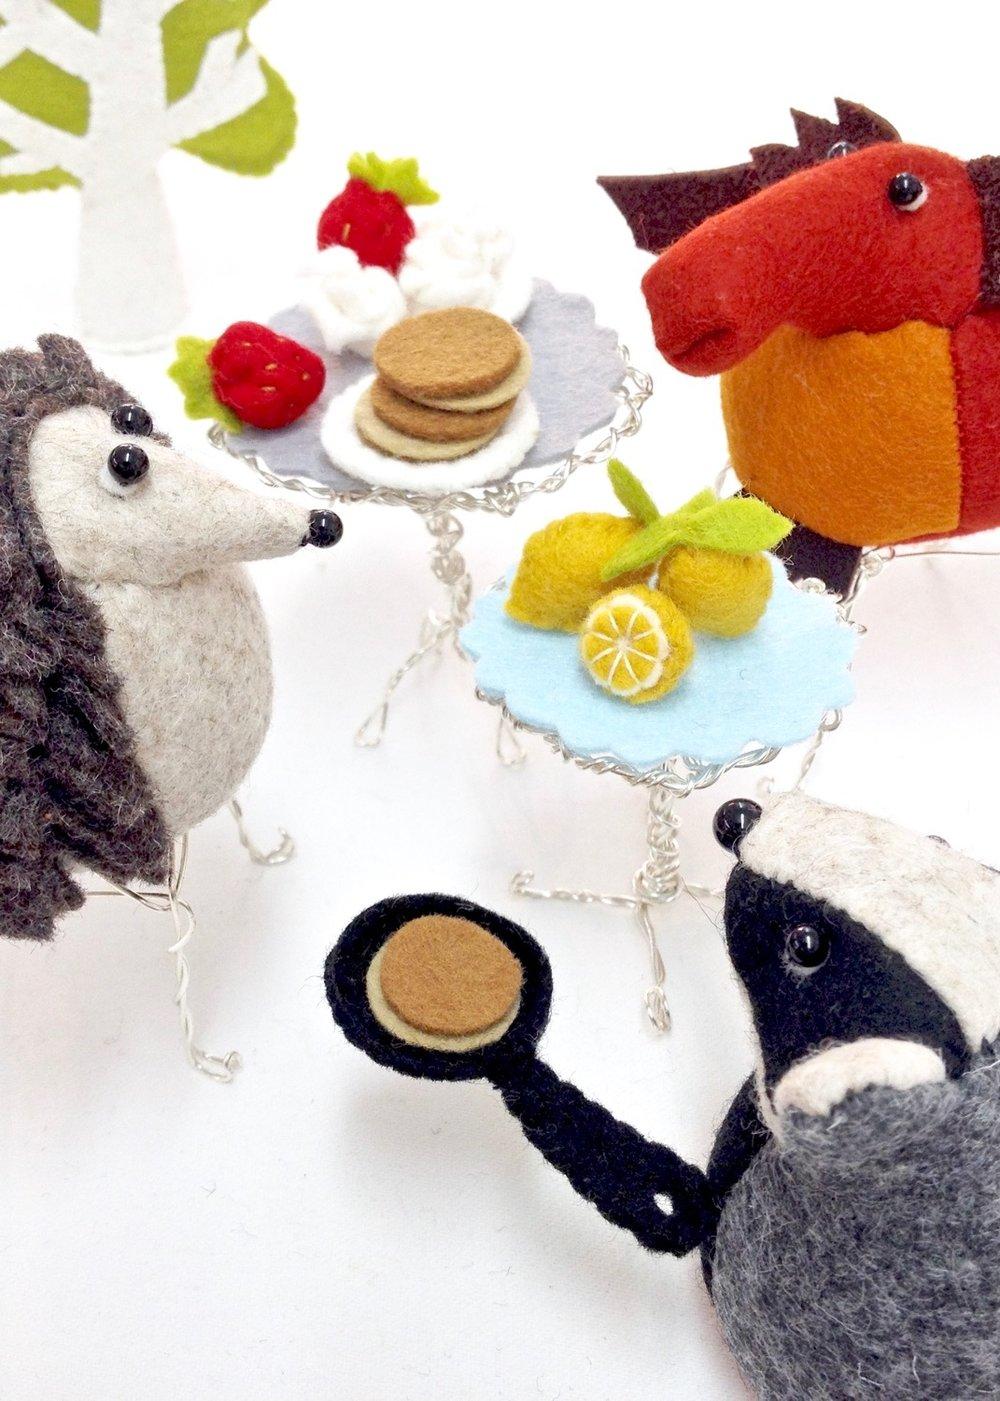 Bilberry Woods characters celebrating pancake day handmade by Laura Mirjami